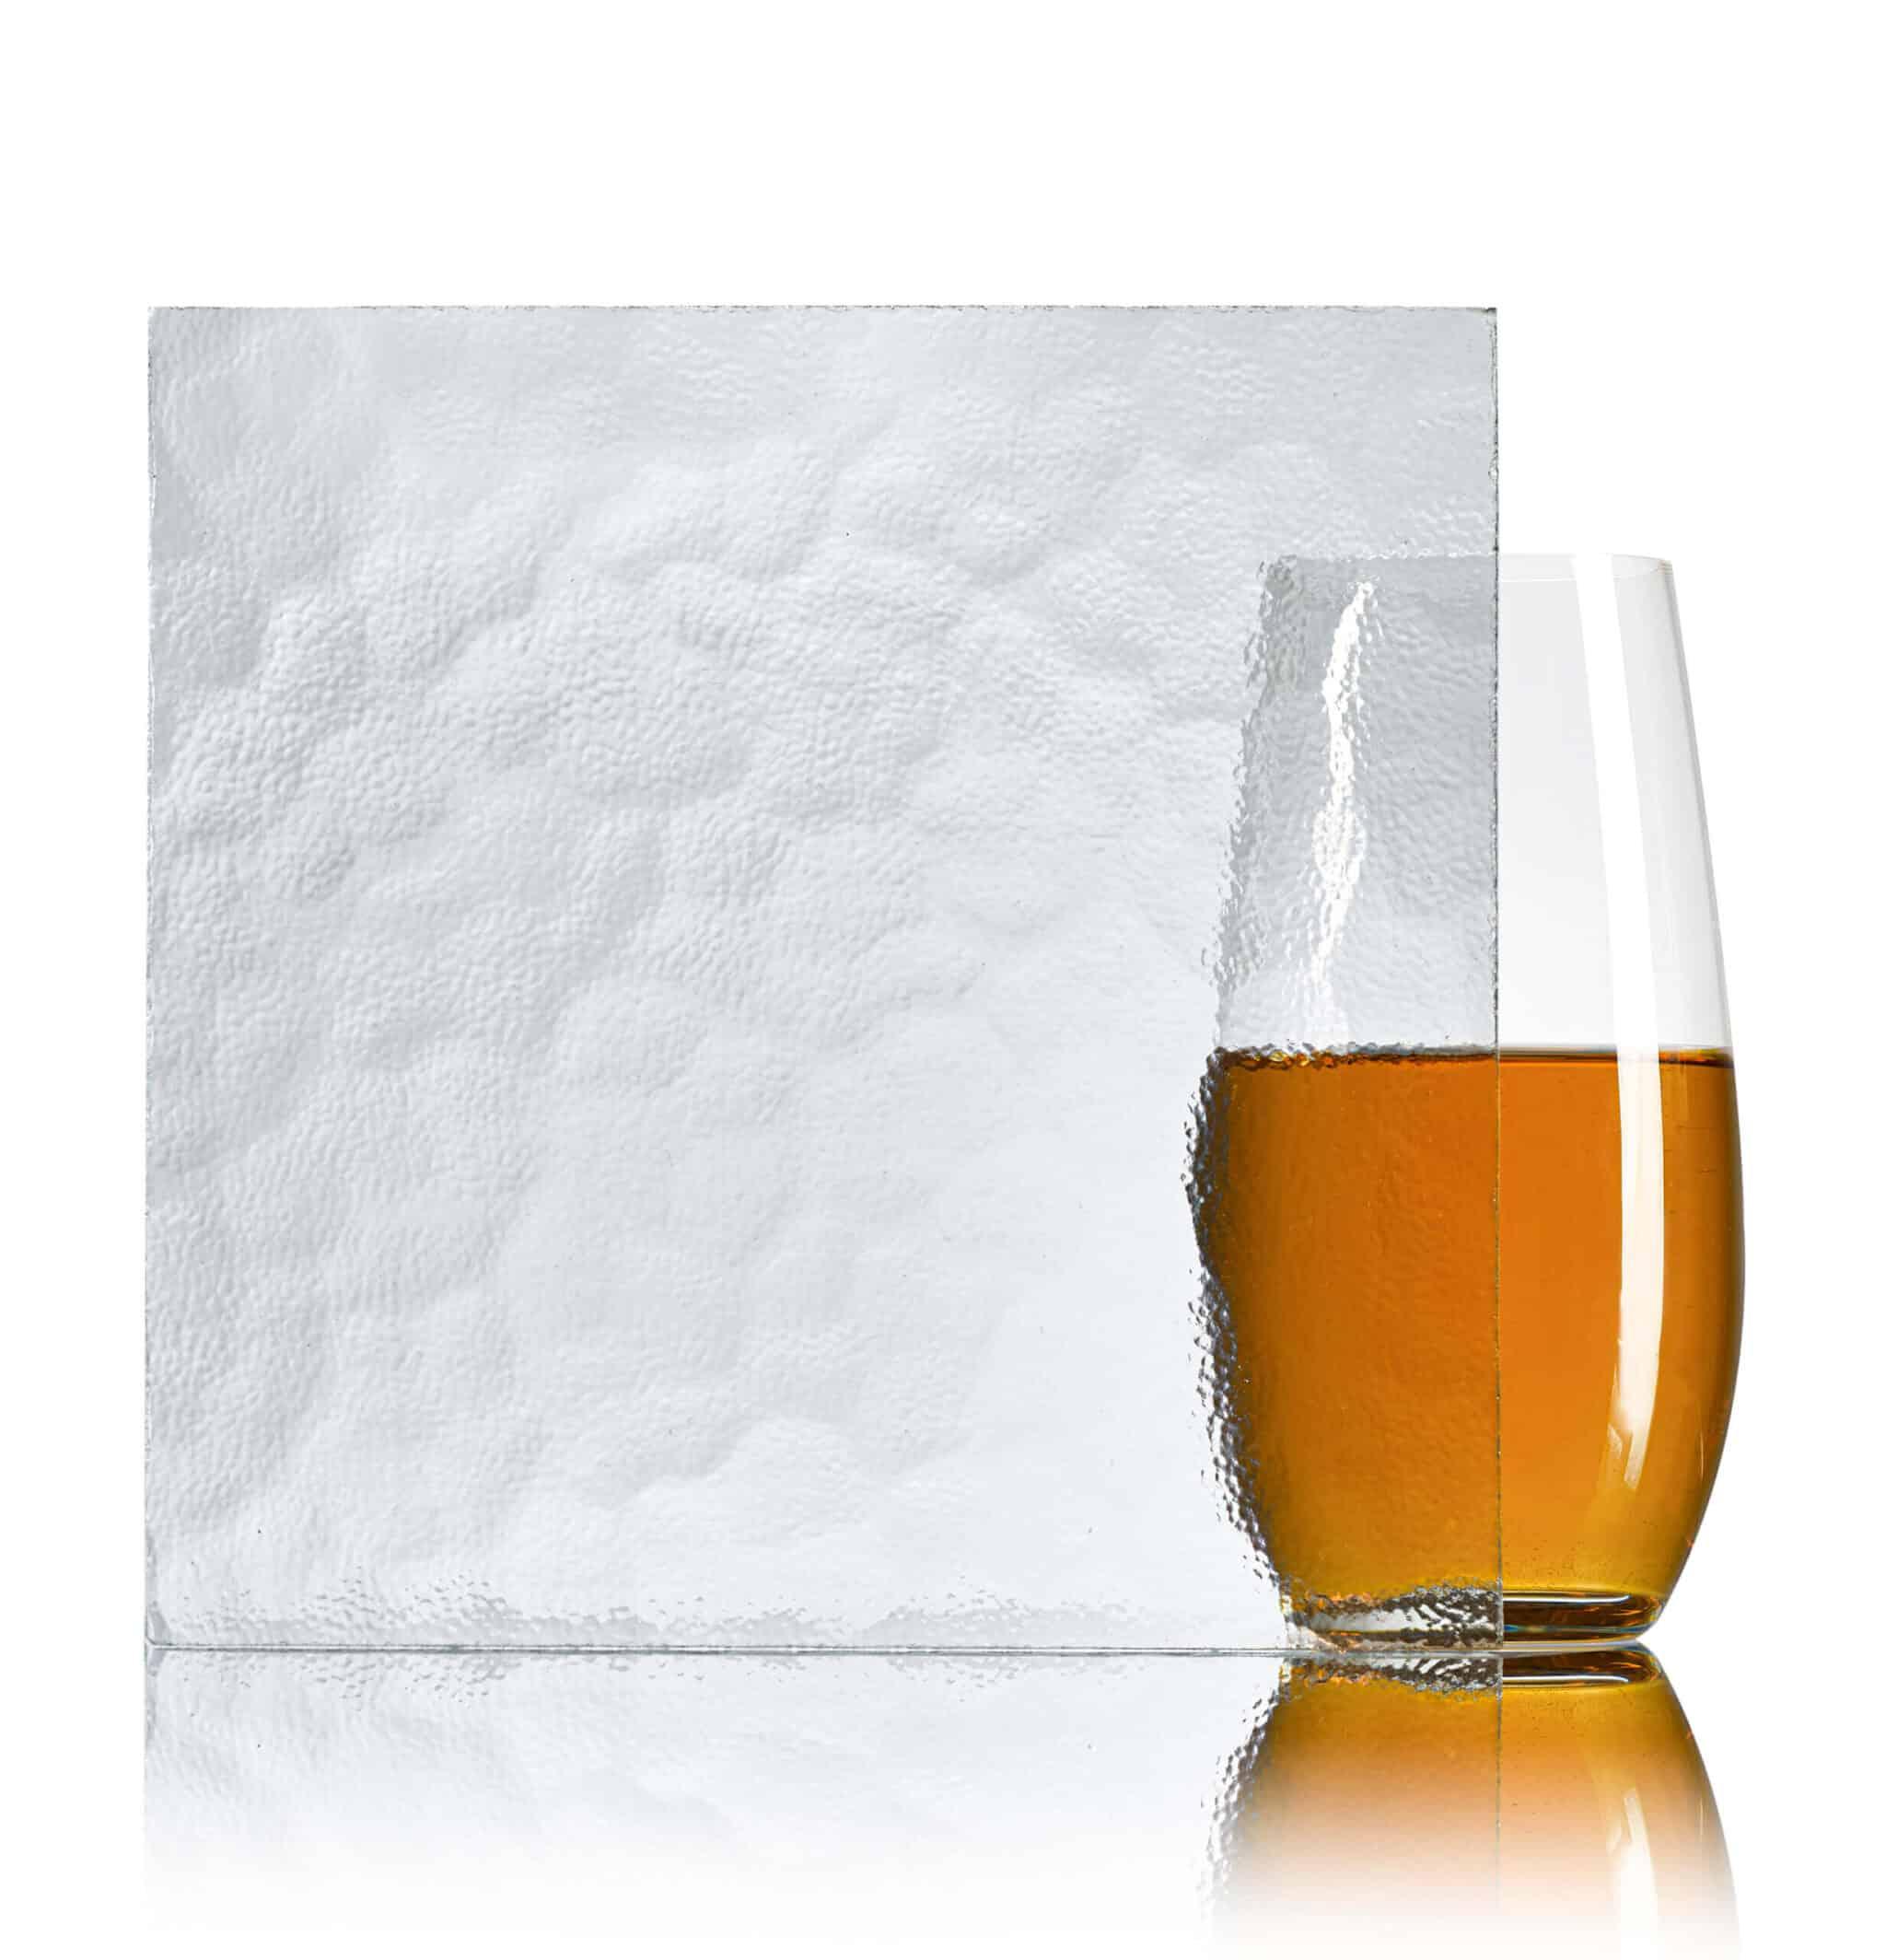 Aqualite Pattern Glass – Walker Glass